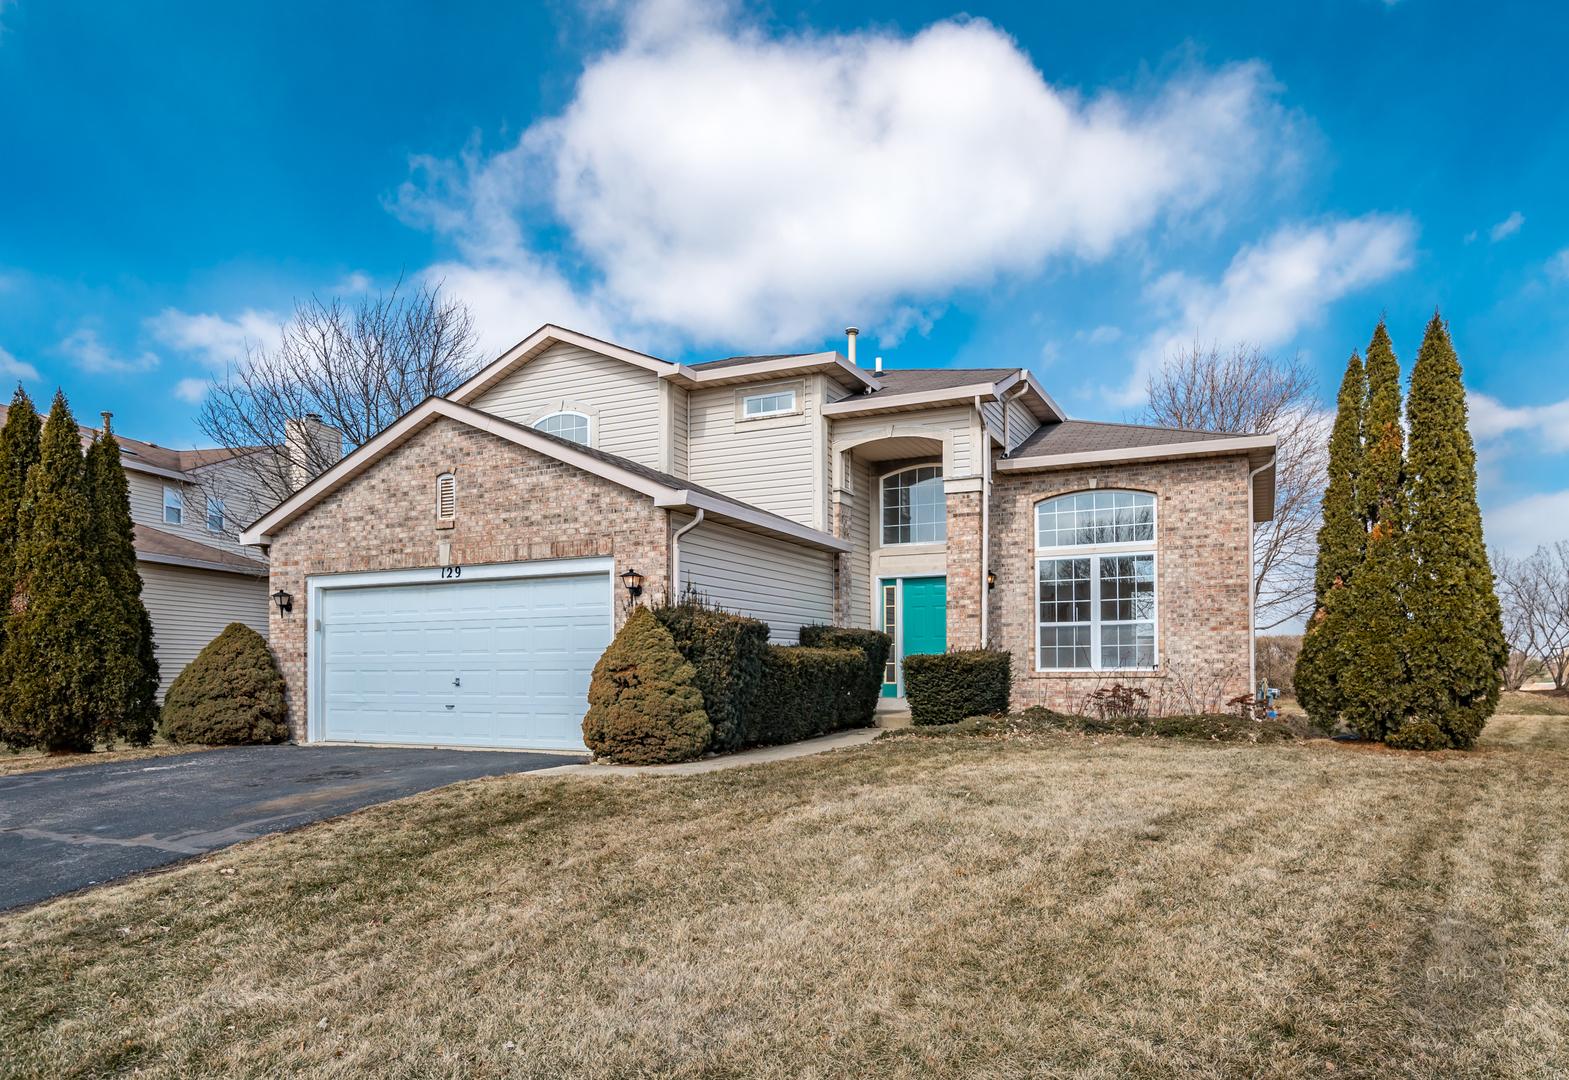 129 Willow Bnd ,Bolingbrook, Illinois 60490